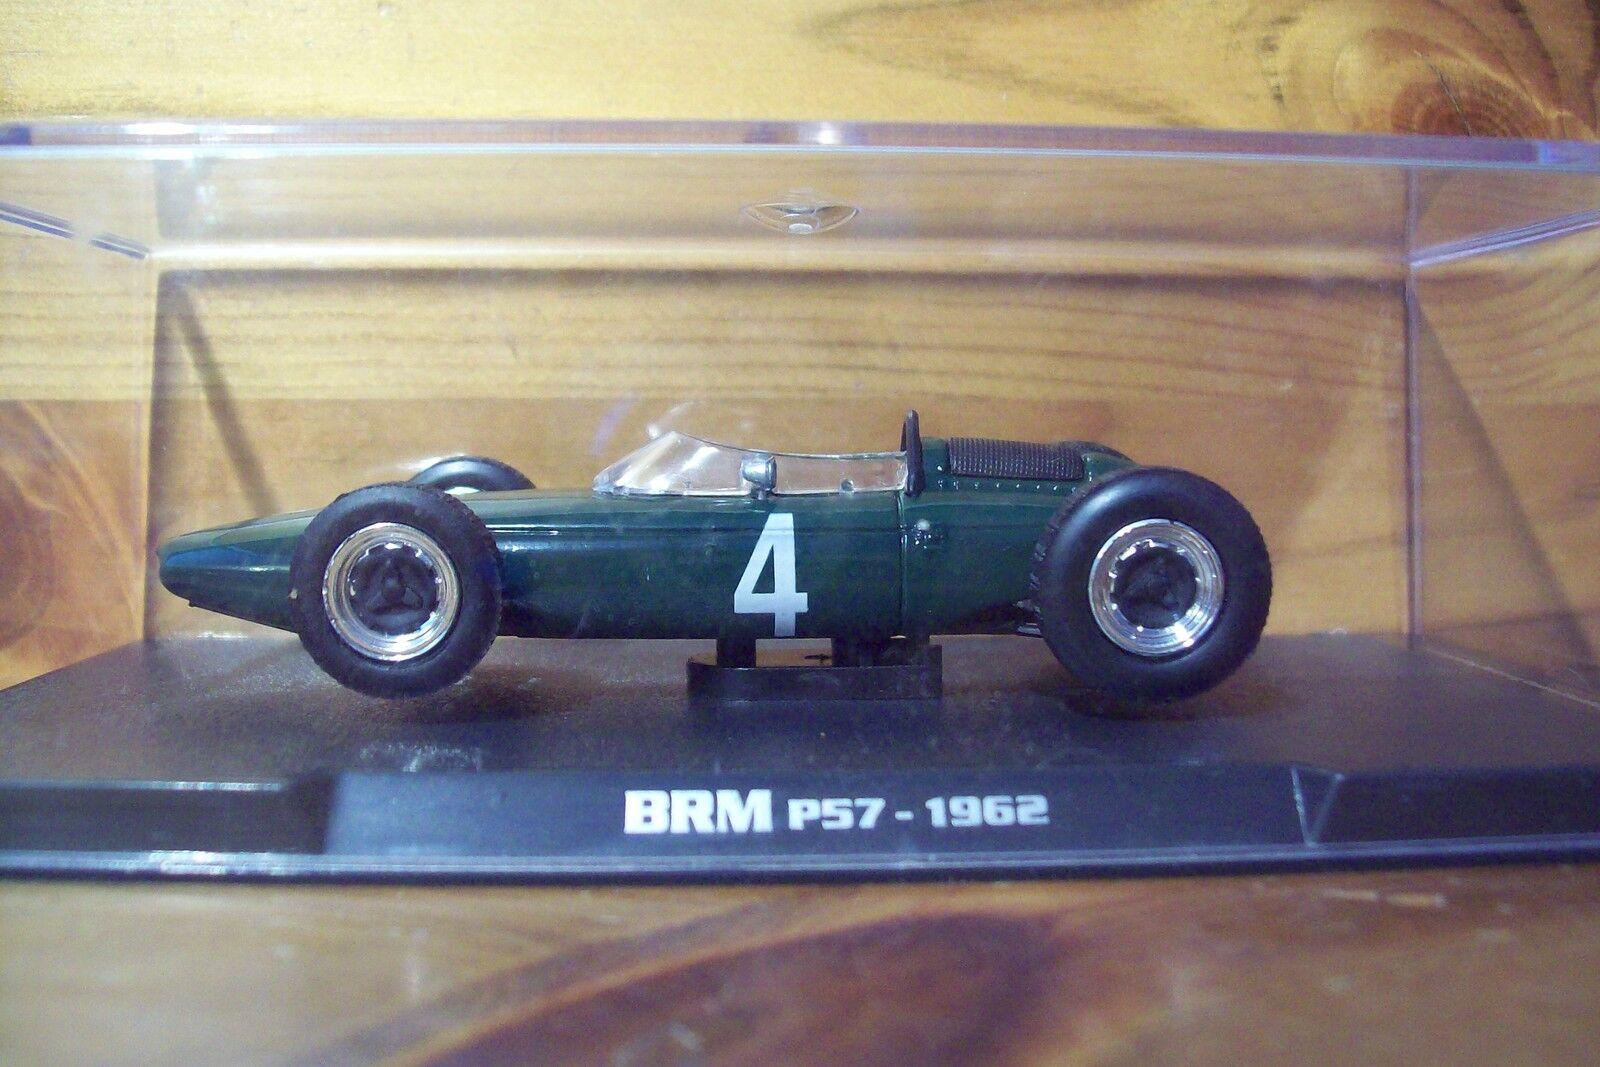 1 43 RBA 1962 BRM P57 GRAHAM HILL 1962 WORLD CHAMPION